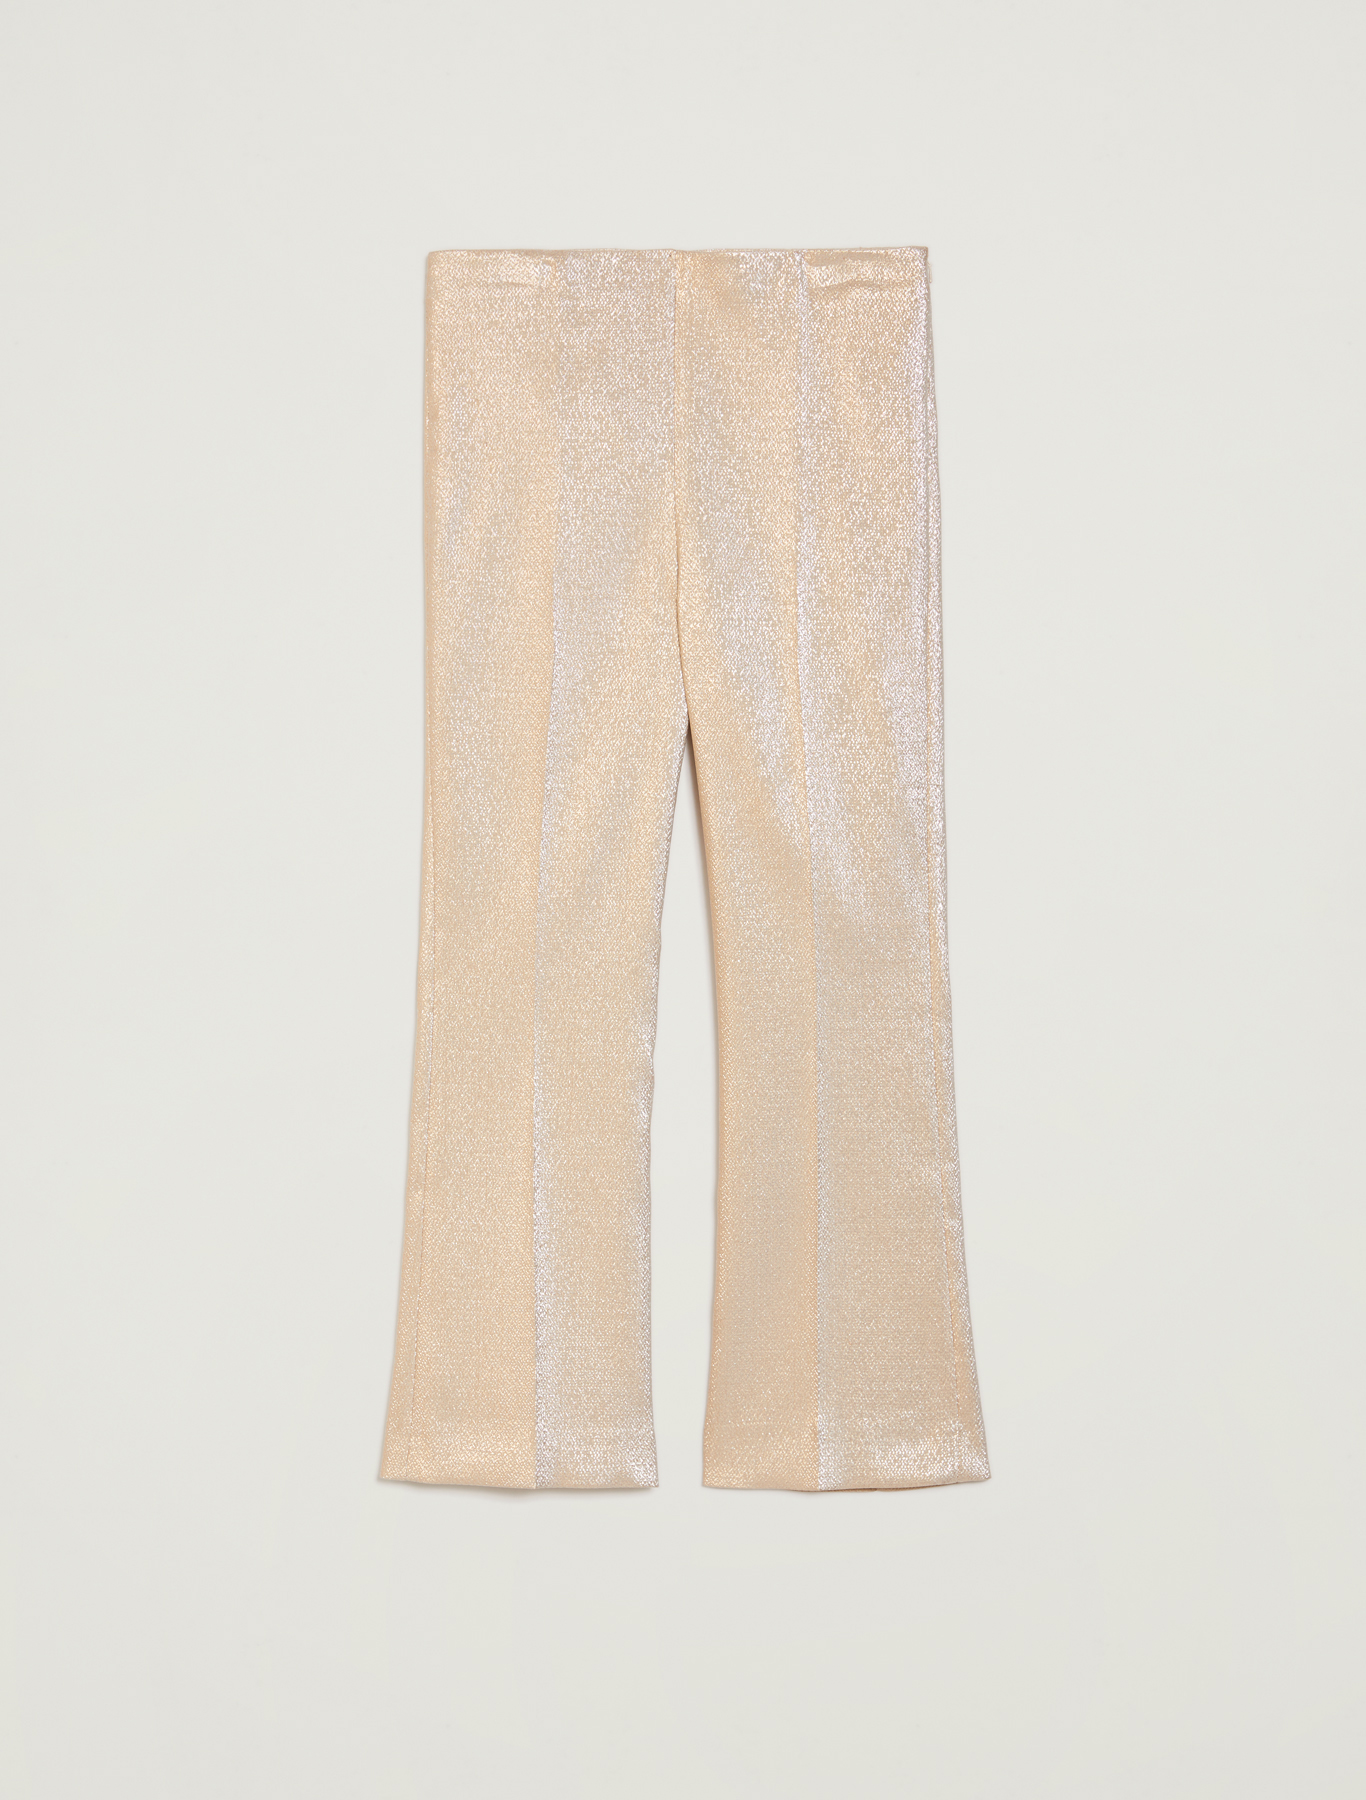 Lamé kick-flare trousers - gold pattern - pennyblack